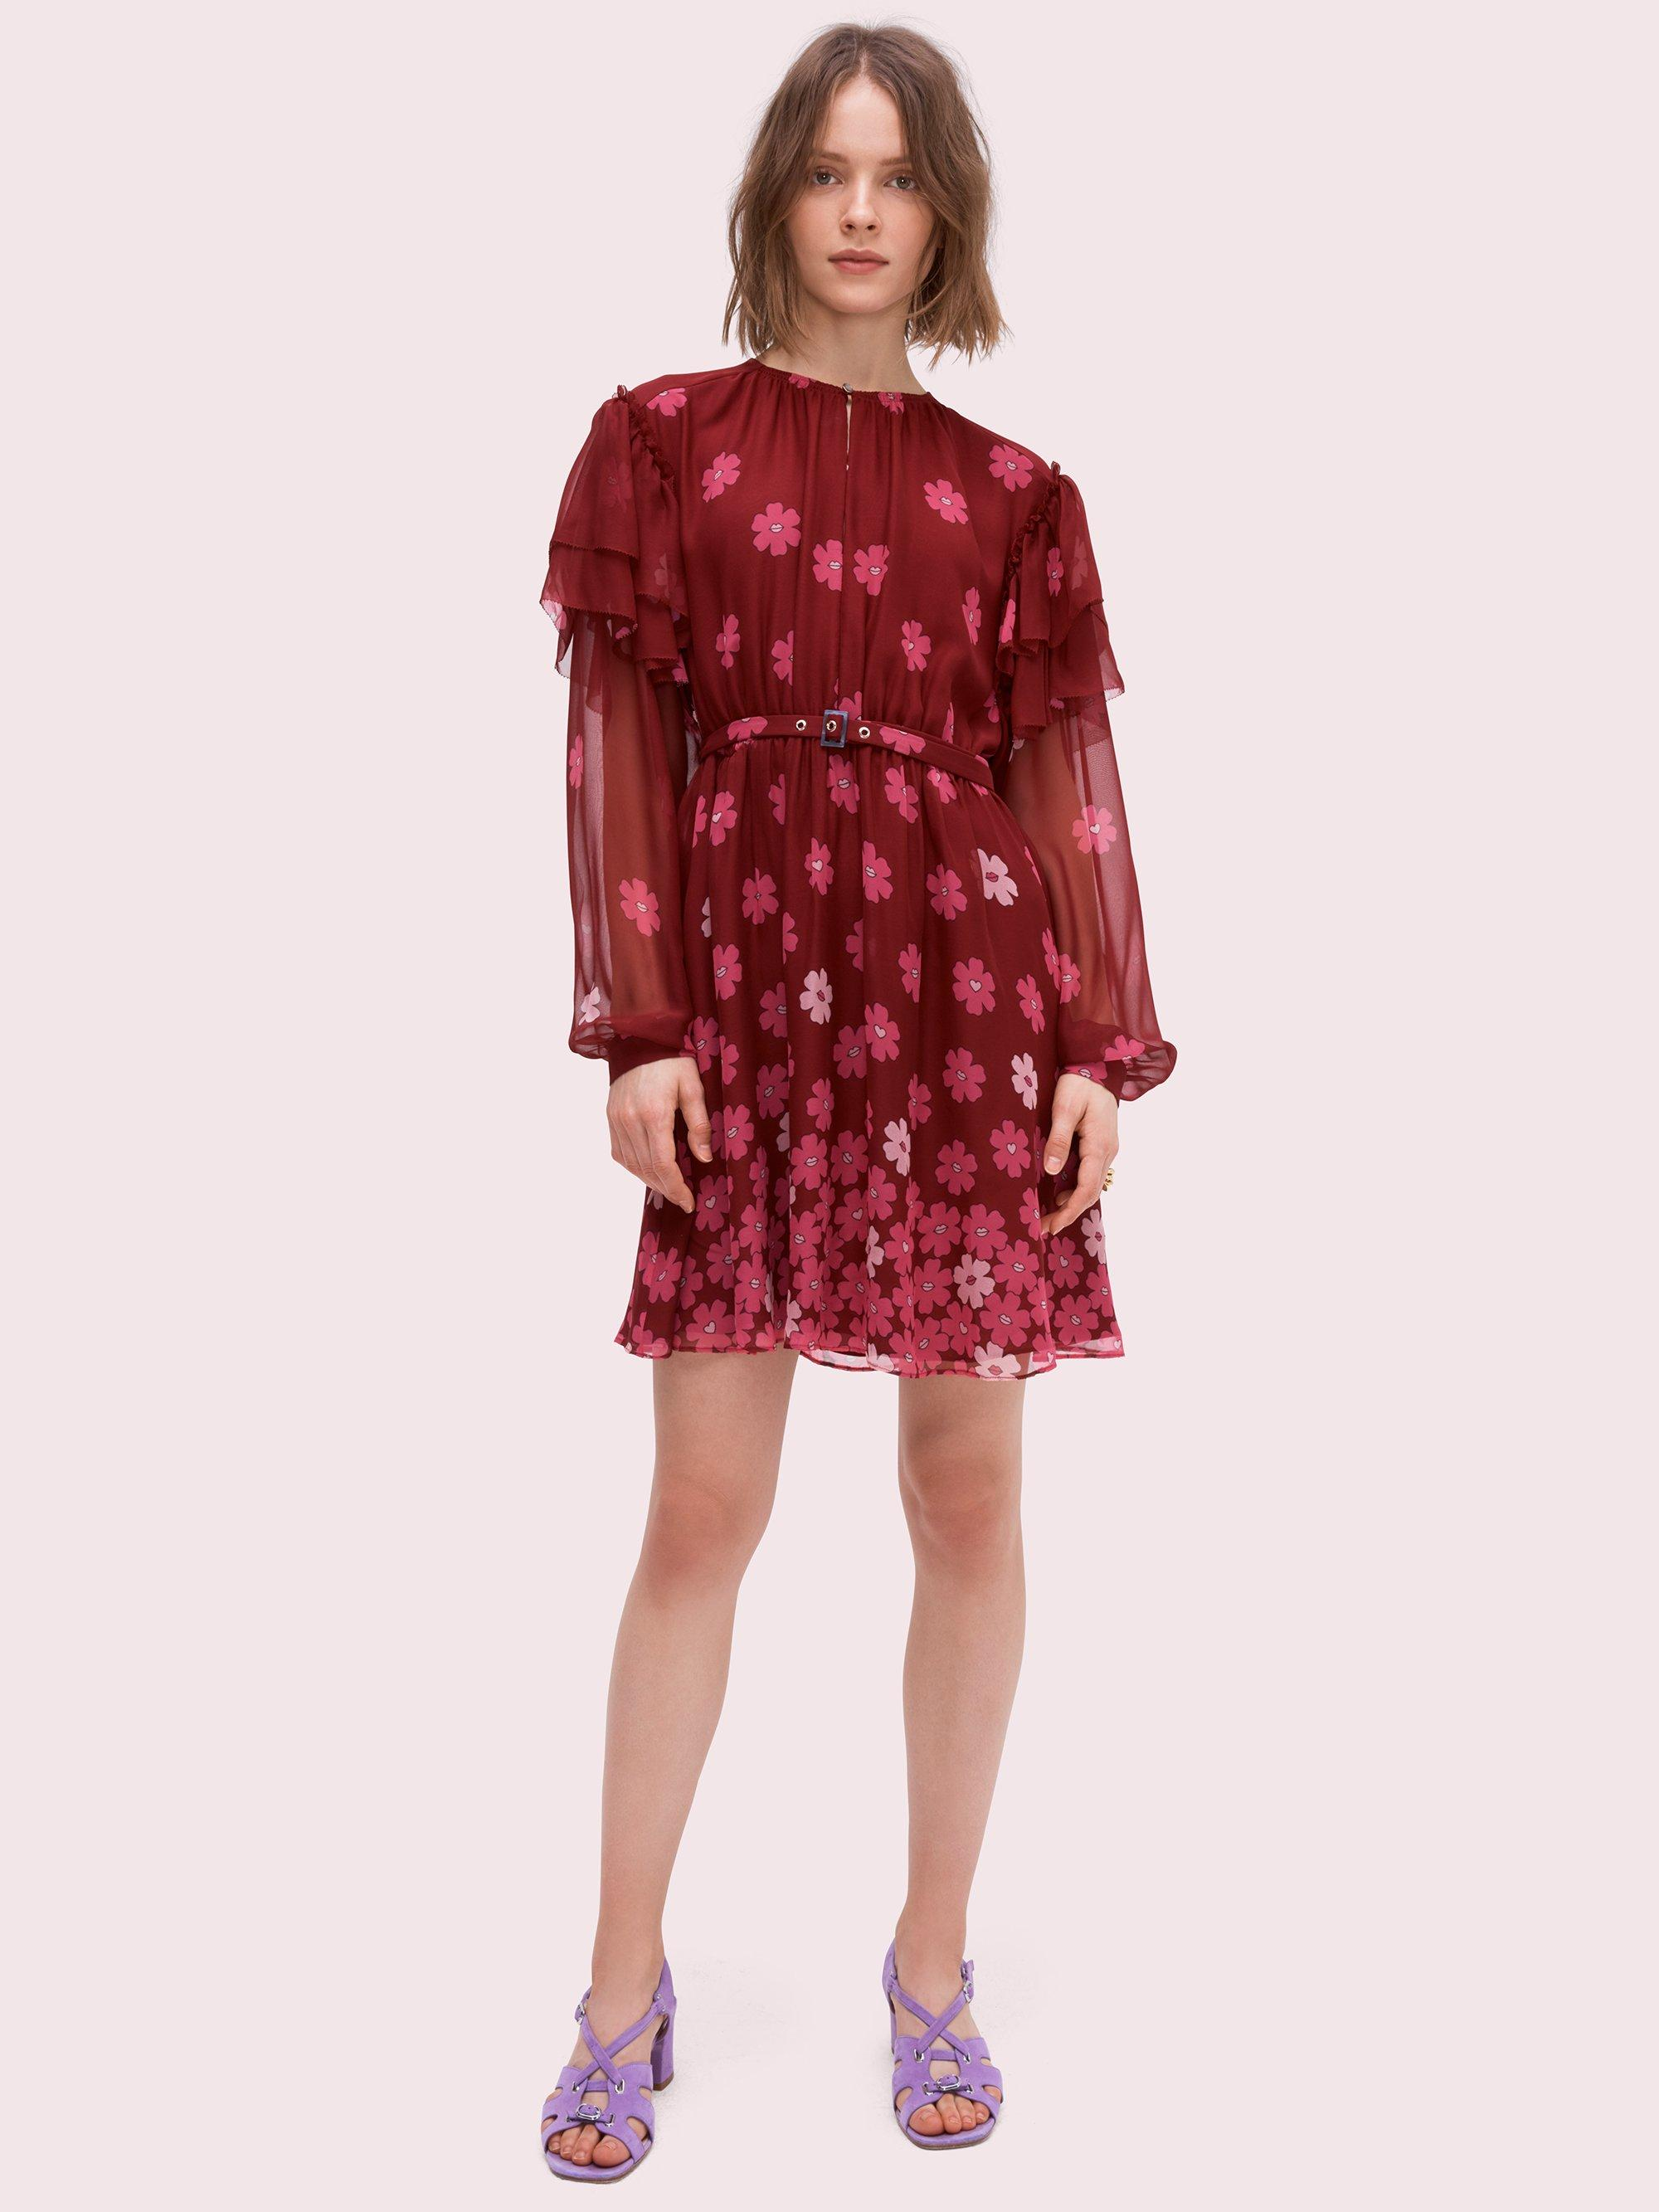 69777e31229f Lyst - Kate Spade Floral Kiss Mini Dress in Red